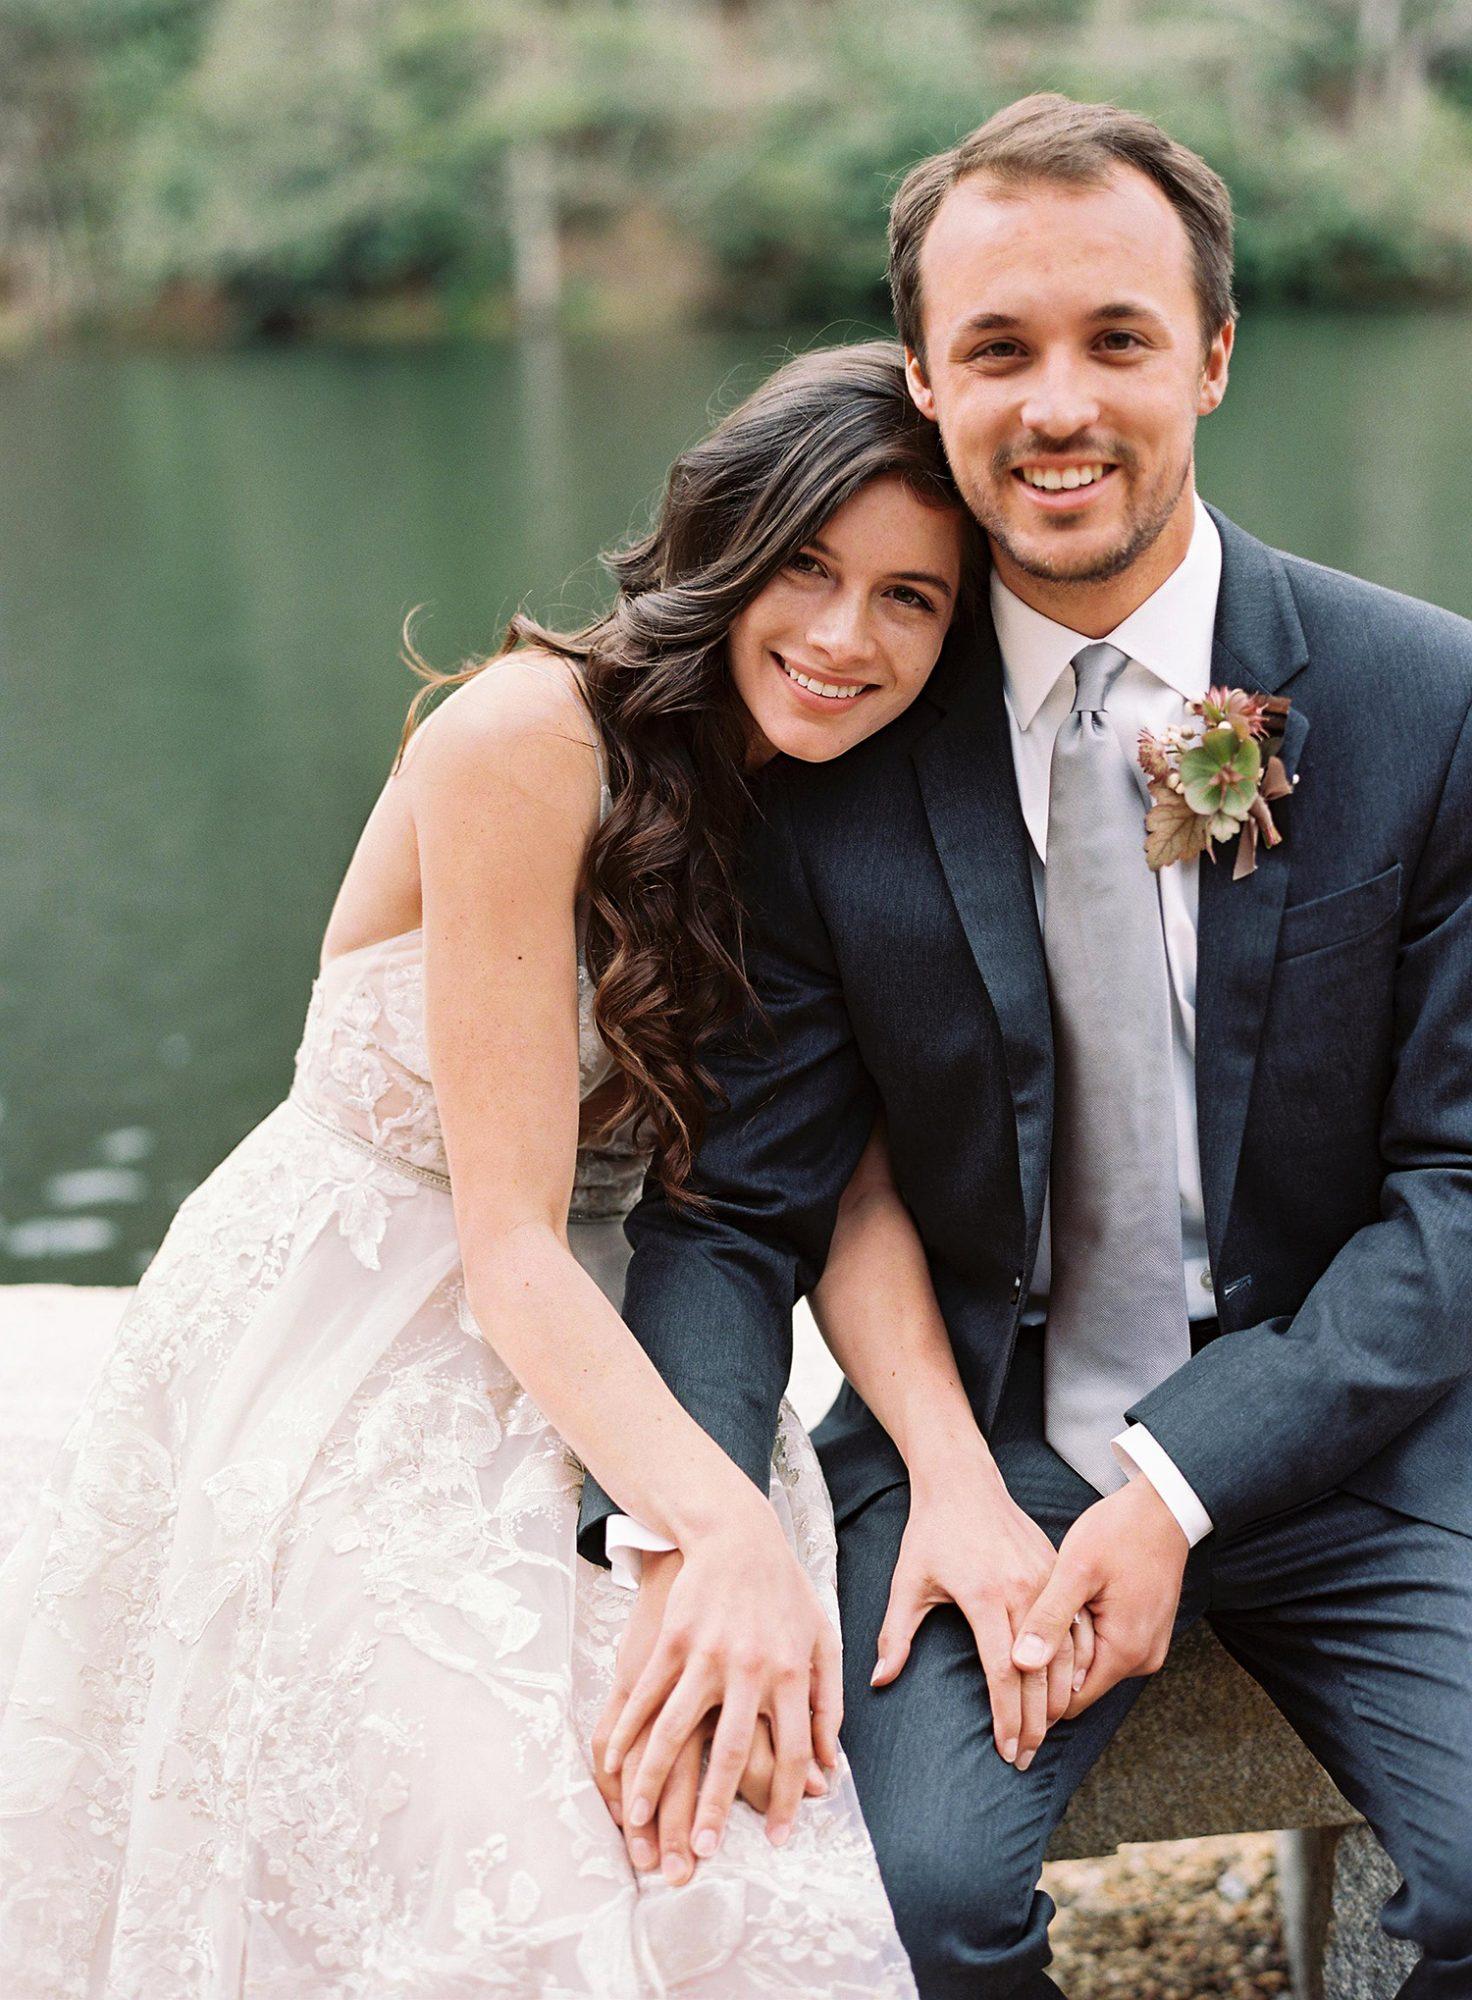 maya trey wedding couple seated holding hands